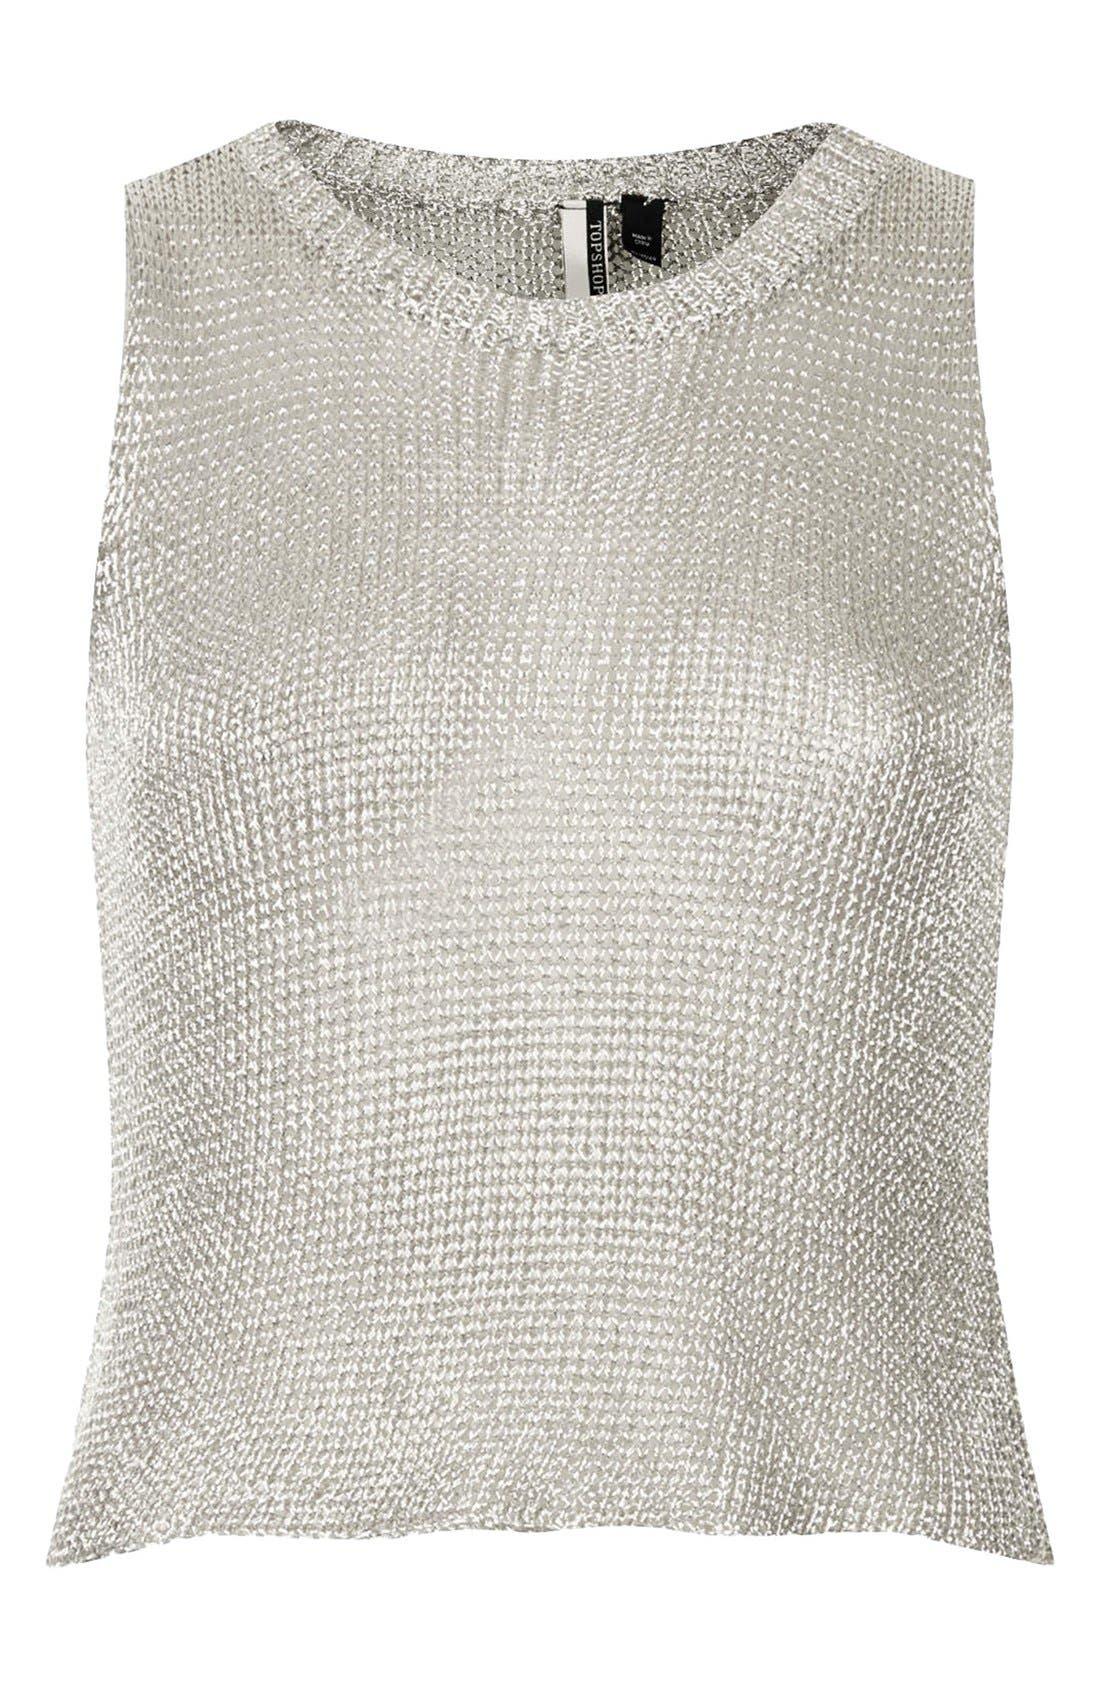 TOPSHOP, Metallic Knit Tank, Alternate thumbnail 3, color, 040